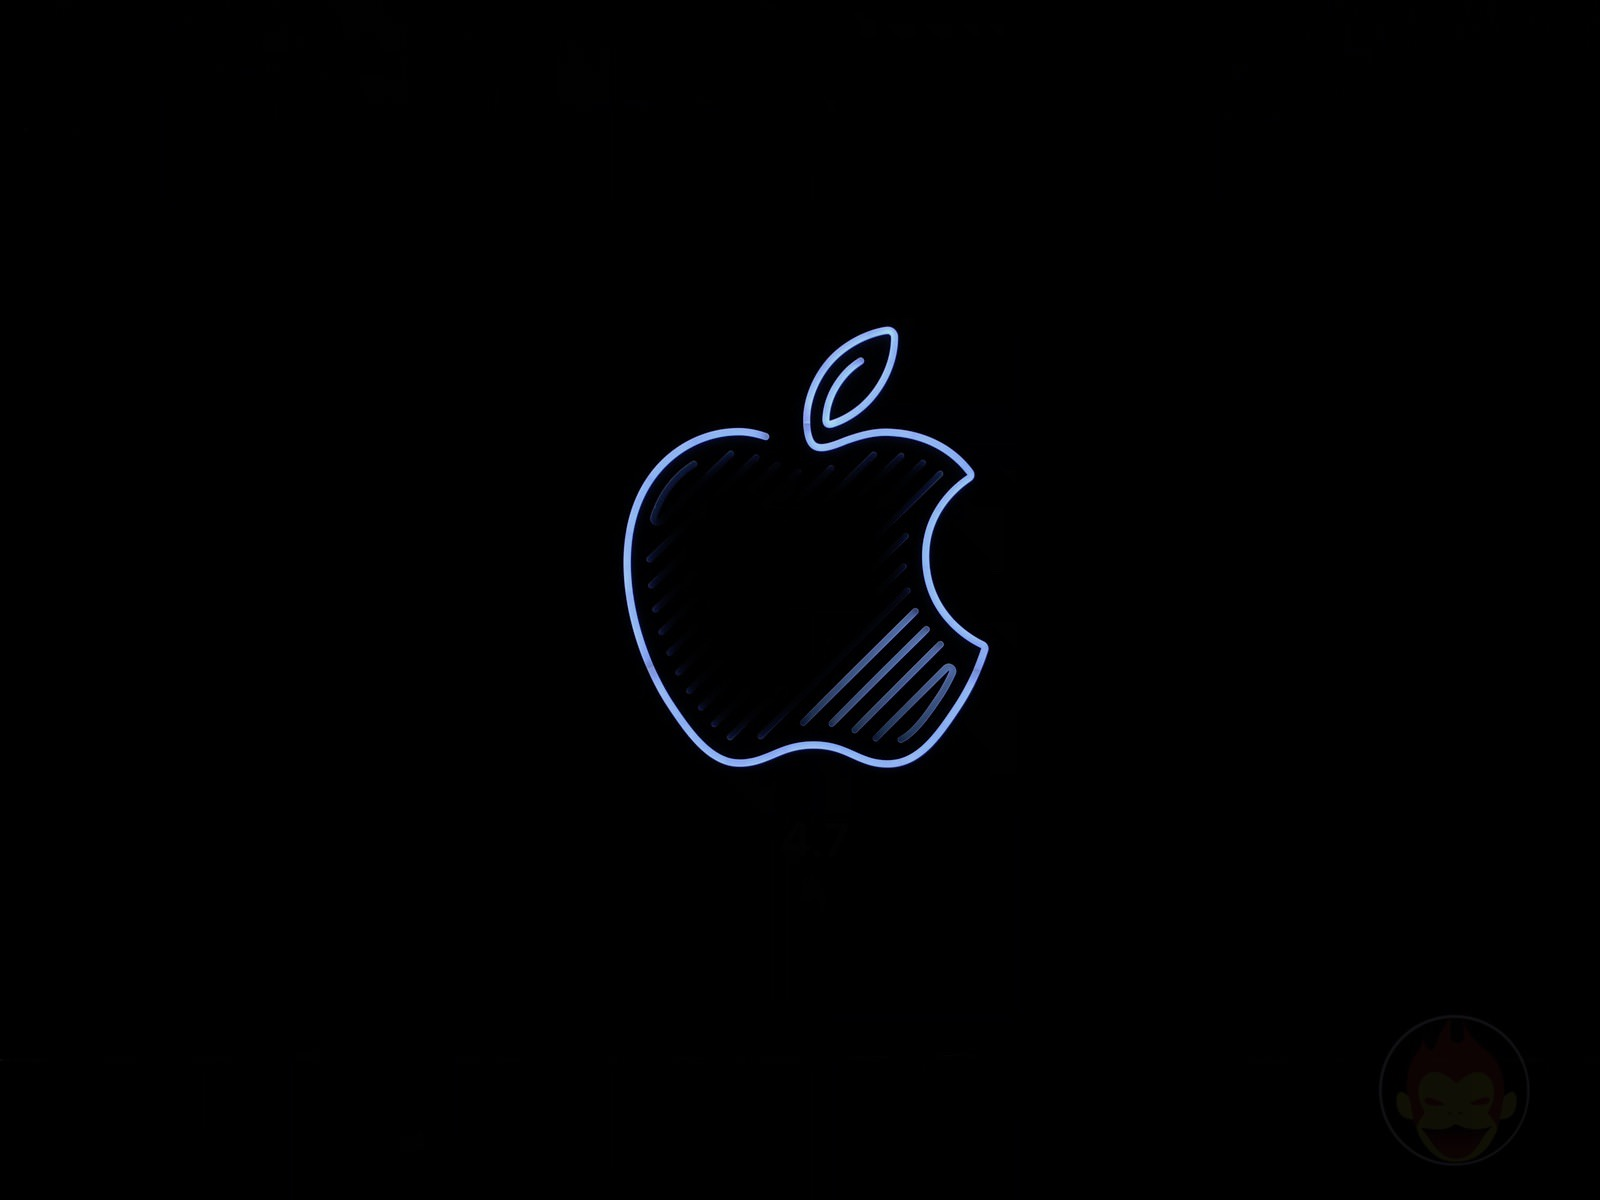 Apple-Shinjuku-After-Dark-17.jpg